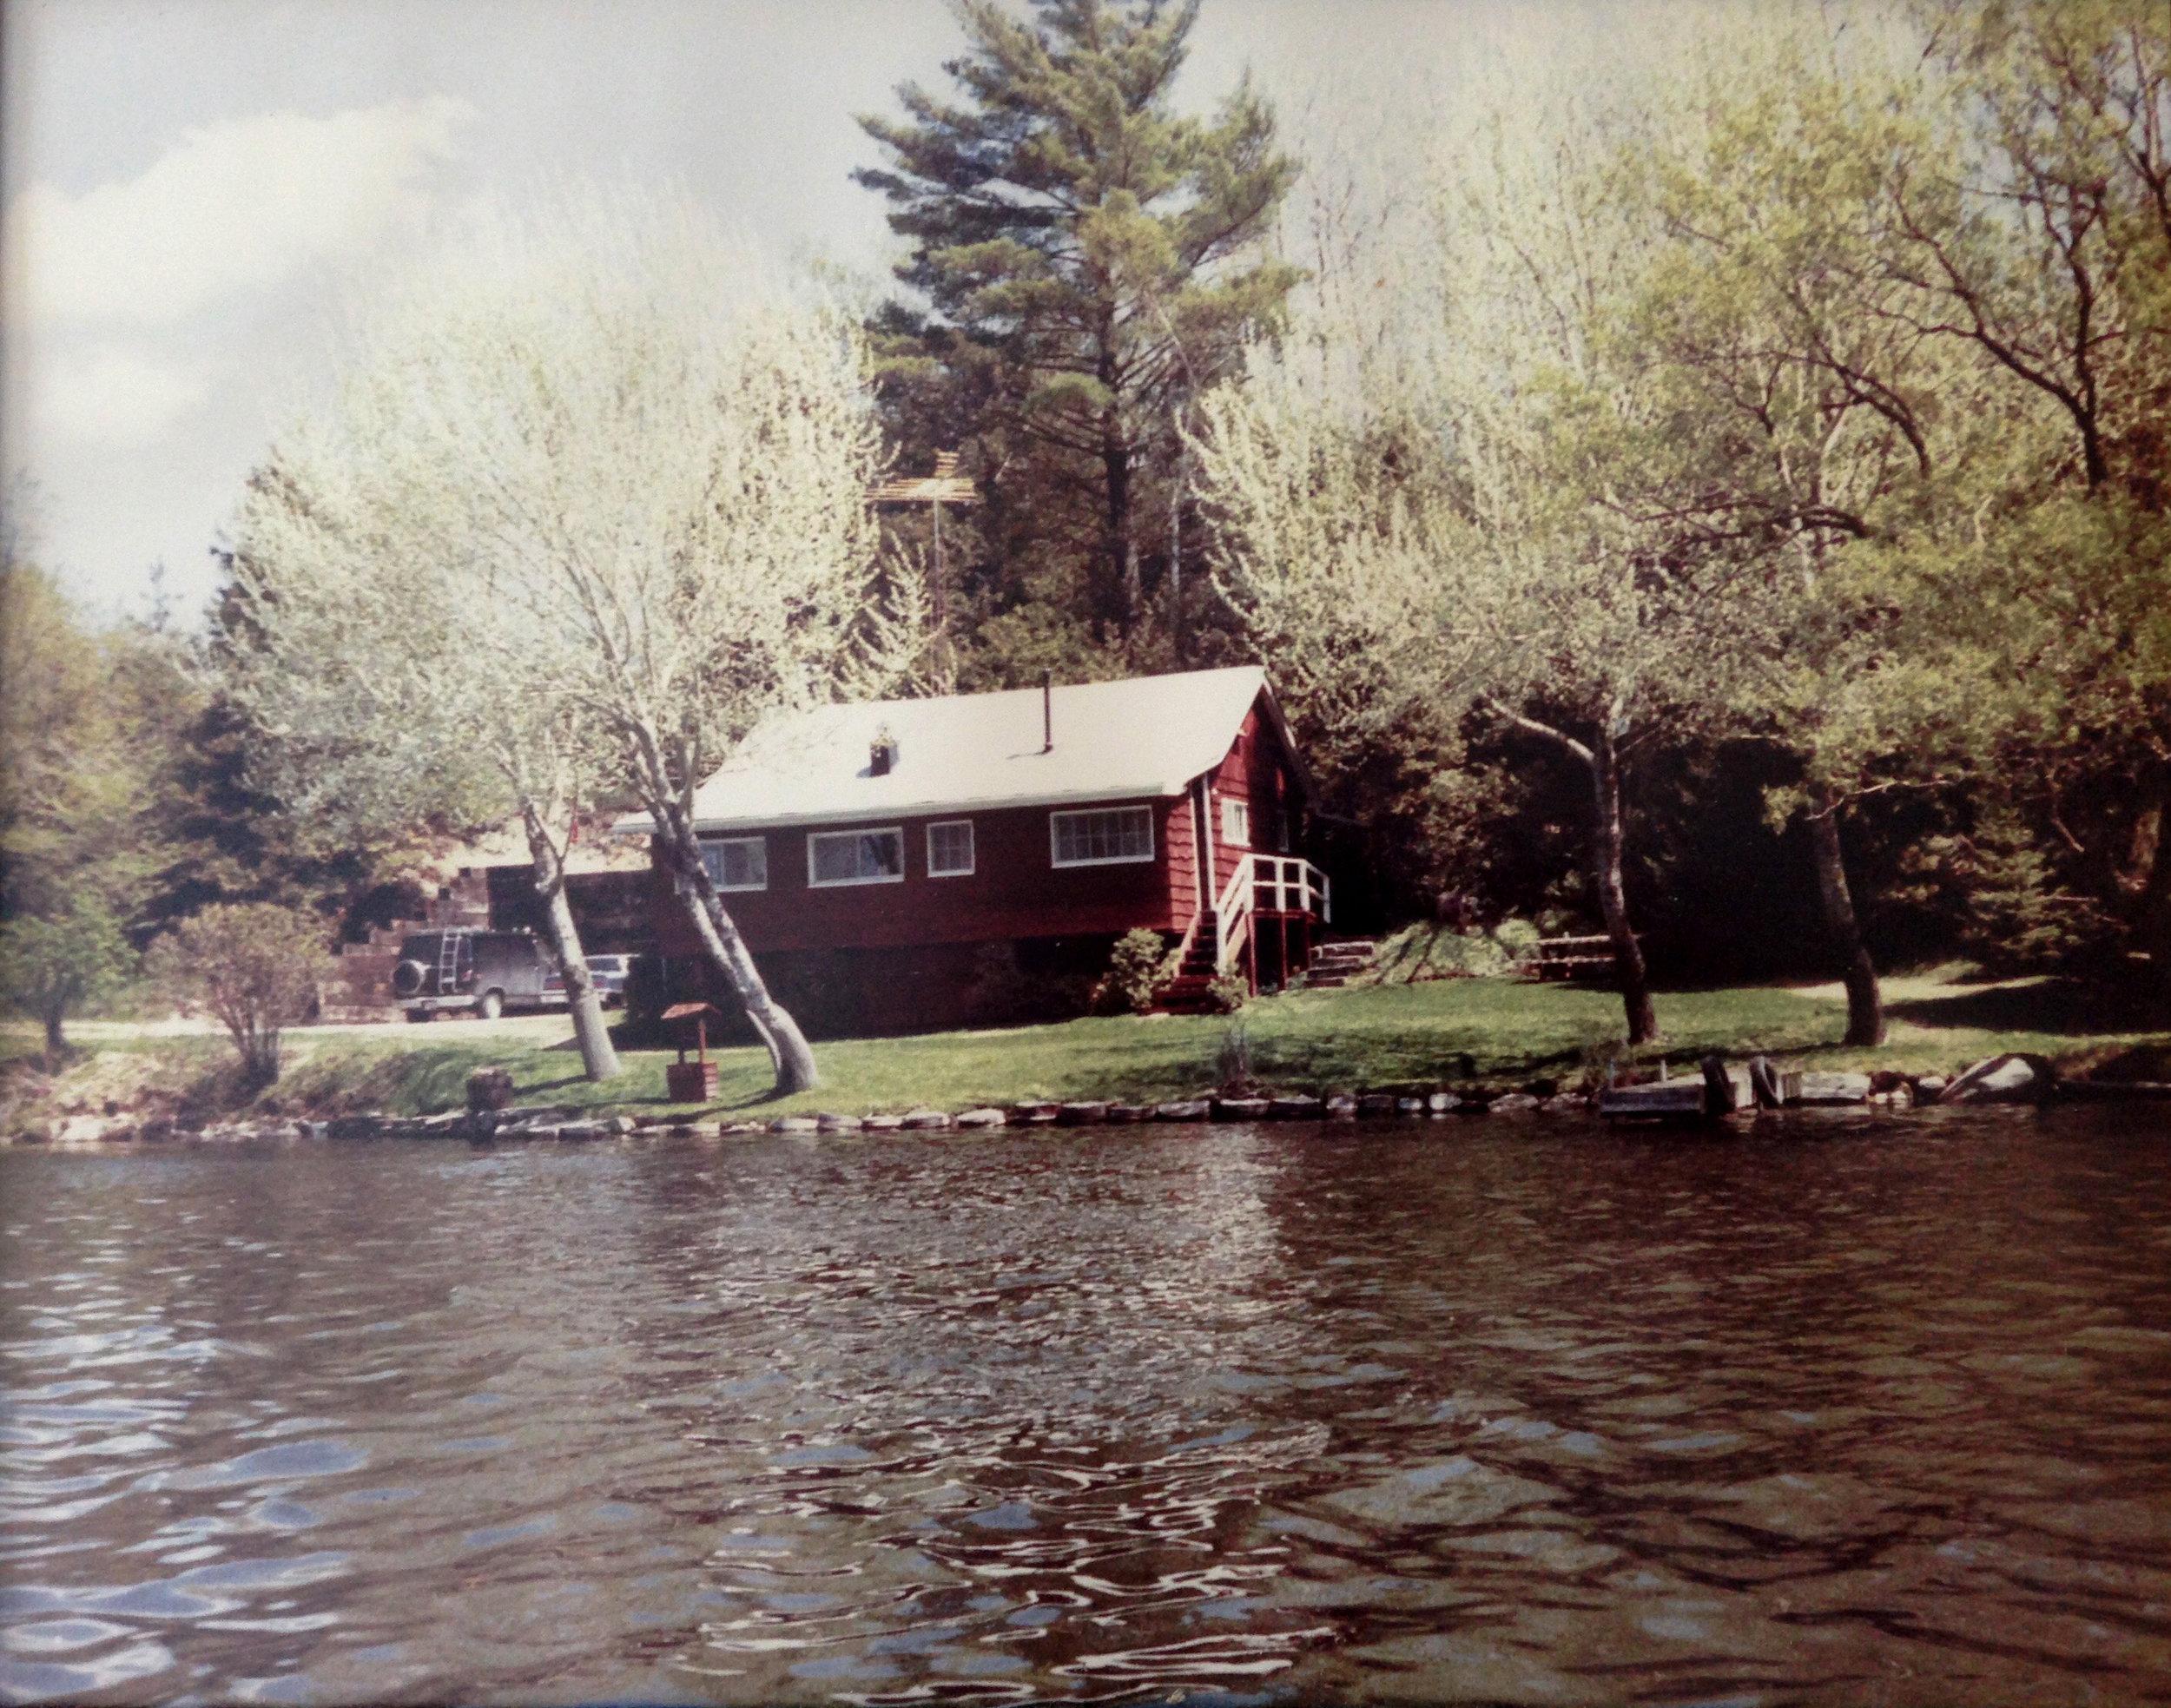 Second cottage.